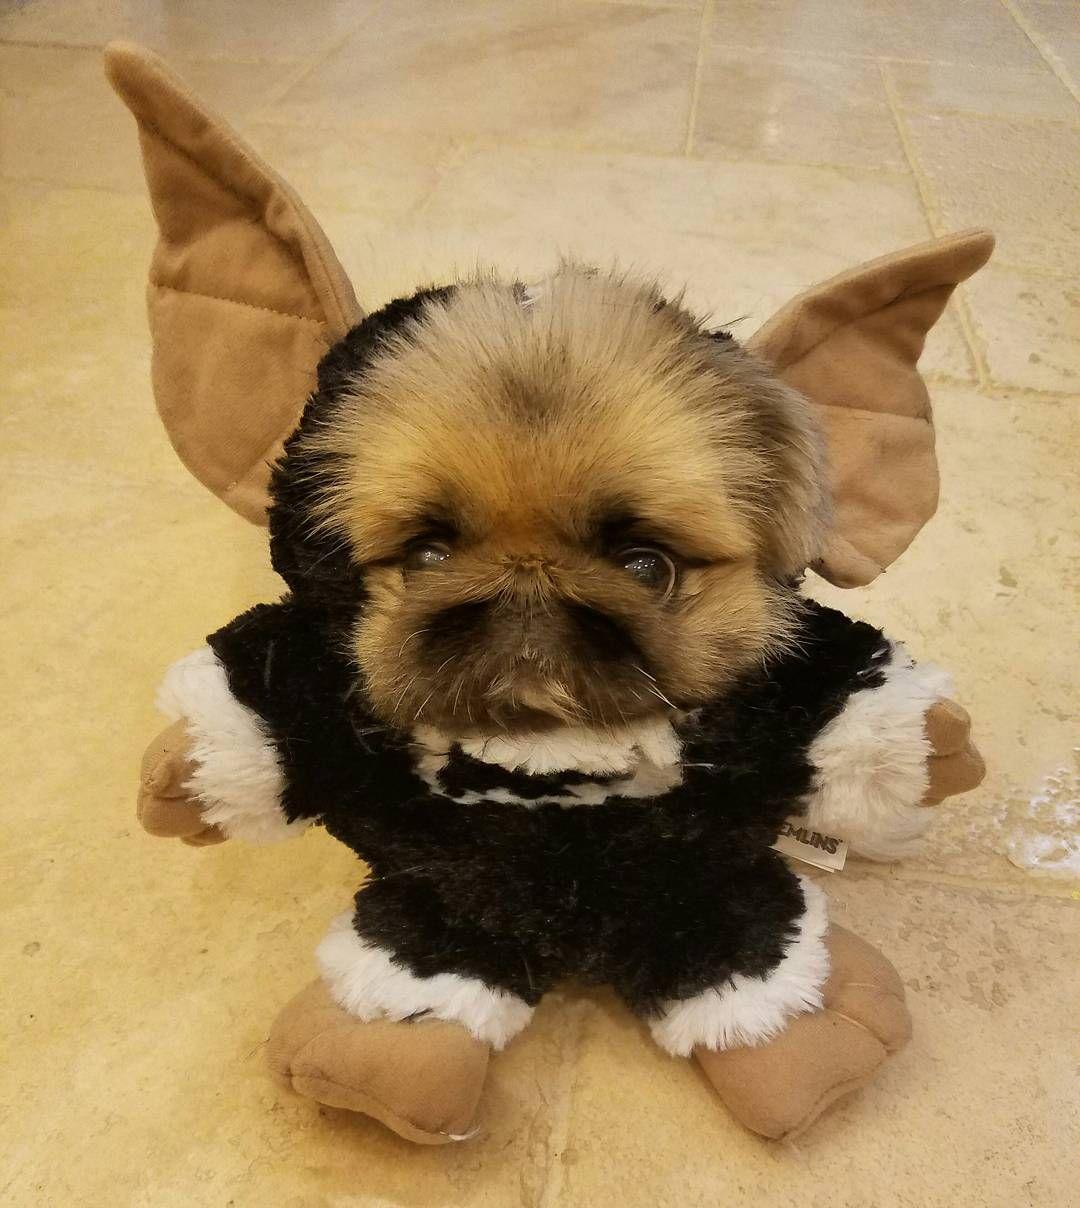 Konabears Gremlin Pekingese Dog Costume Halloween Dog